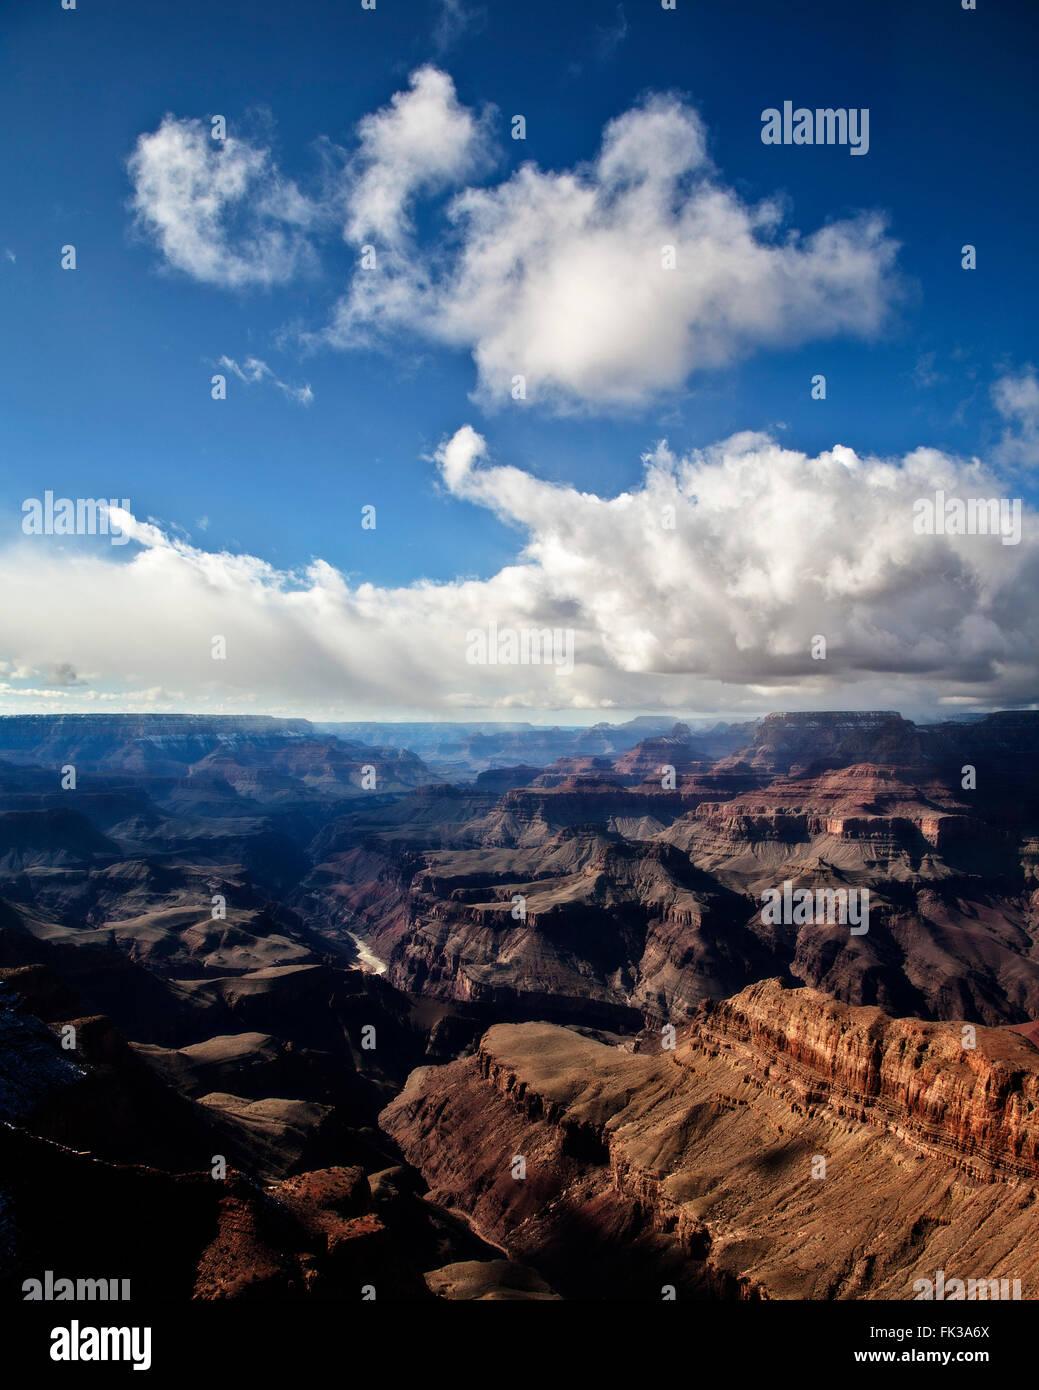 Scene from Lipan Point, Grand Canyon south rim, Arizona Stock Photo